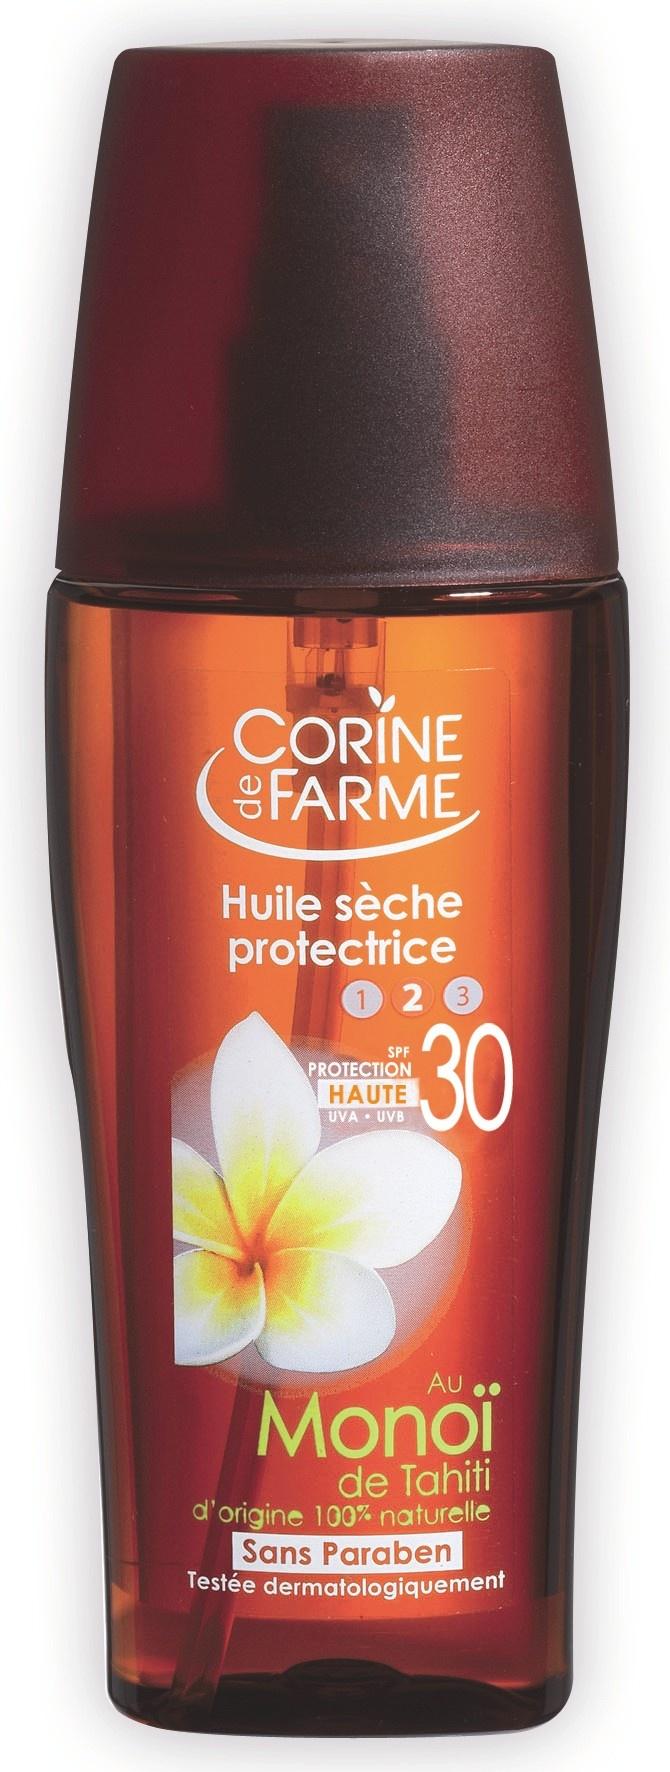 Beschermende droge olie SPF 30 - Corine de Farme